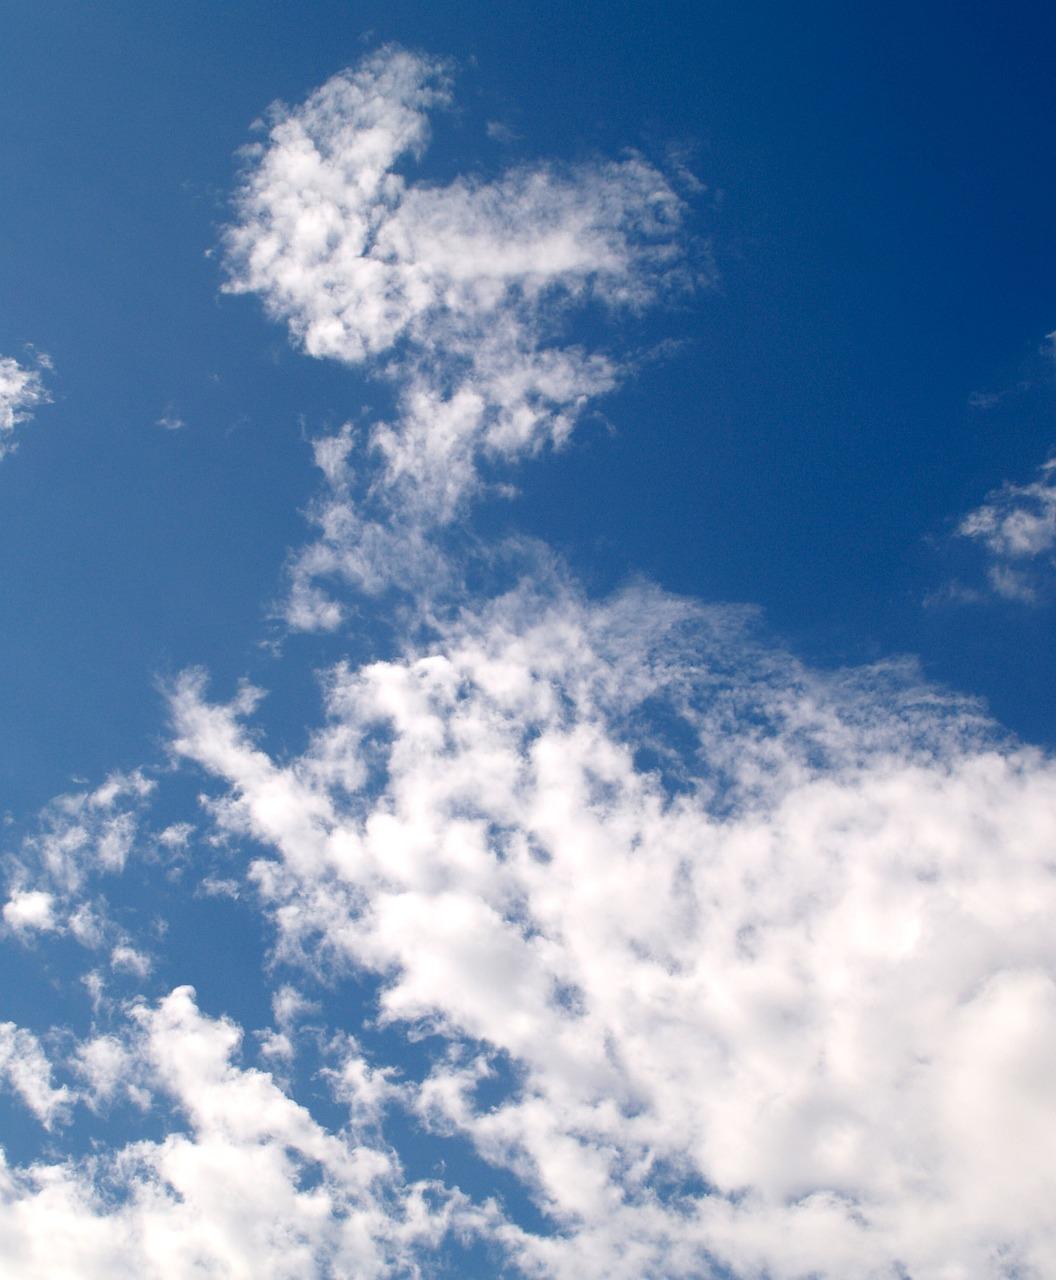 Awan Langit Biru - Foto Gratis Di Pixabay